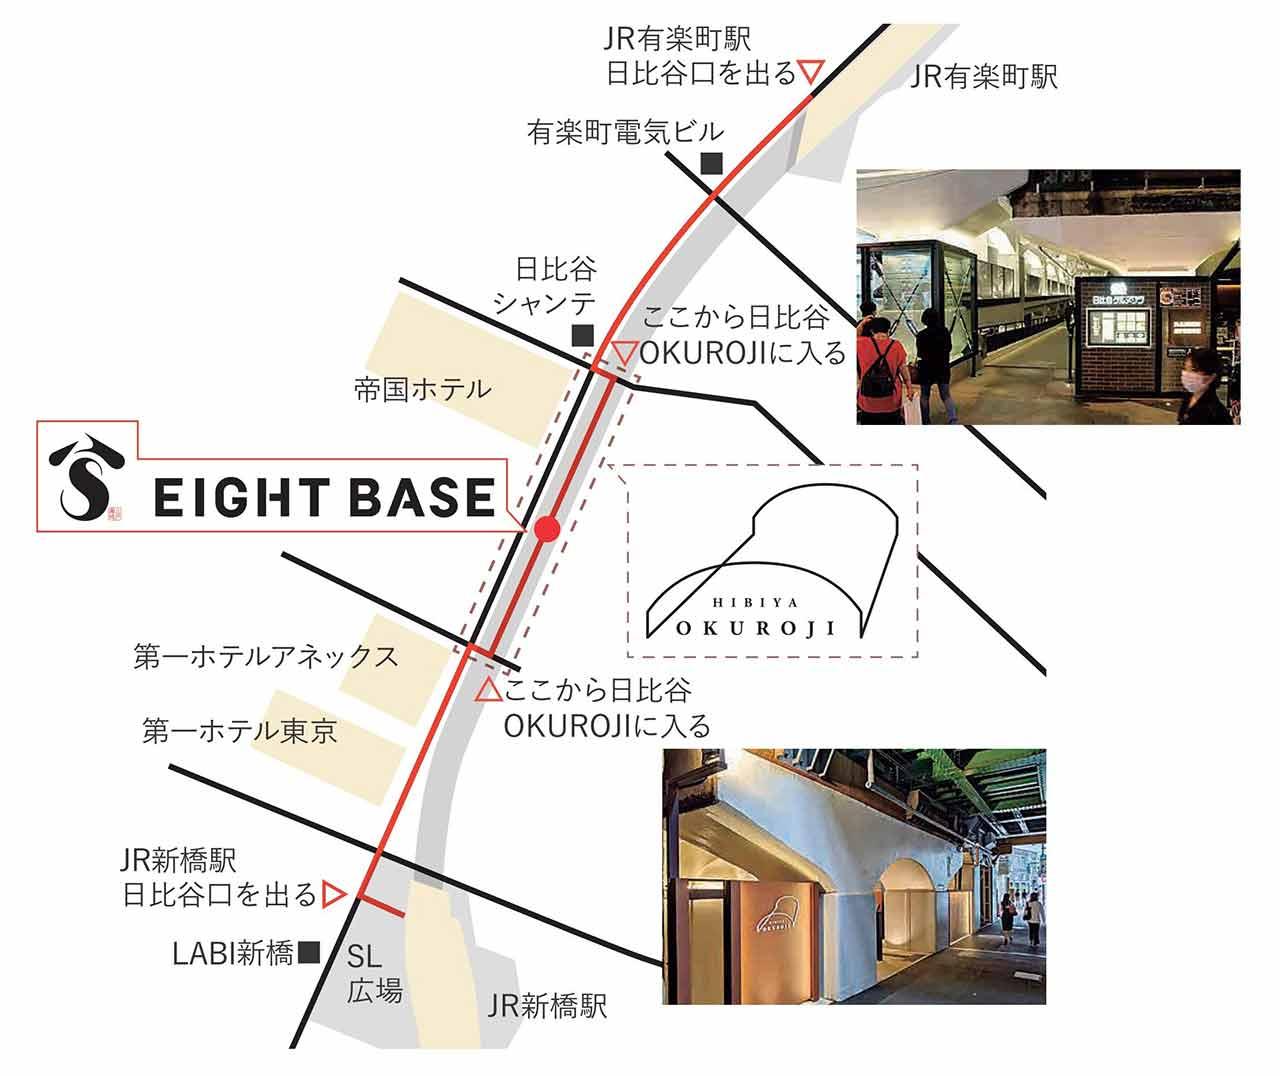 8base周辺地図